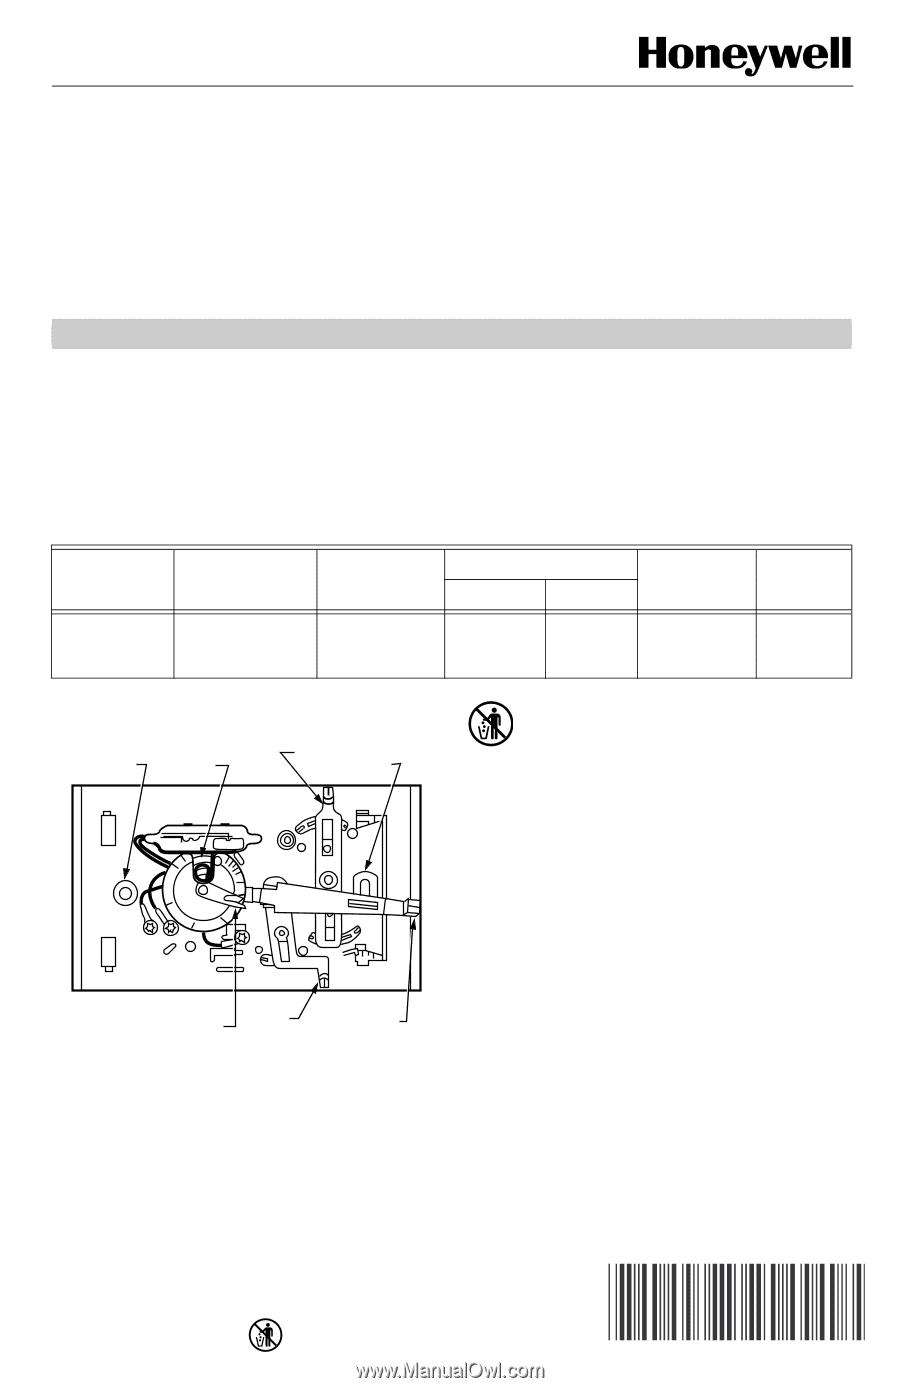 Wiring Diagram Honeywell Thermostat Wiring Honeywell Thermostat Wiring